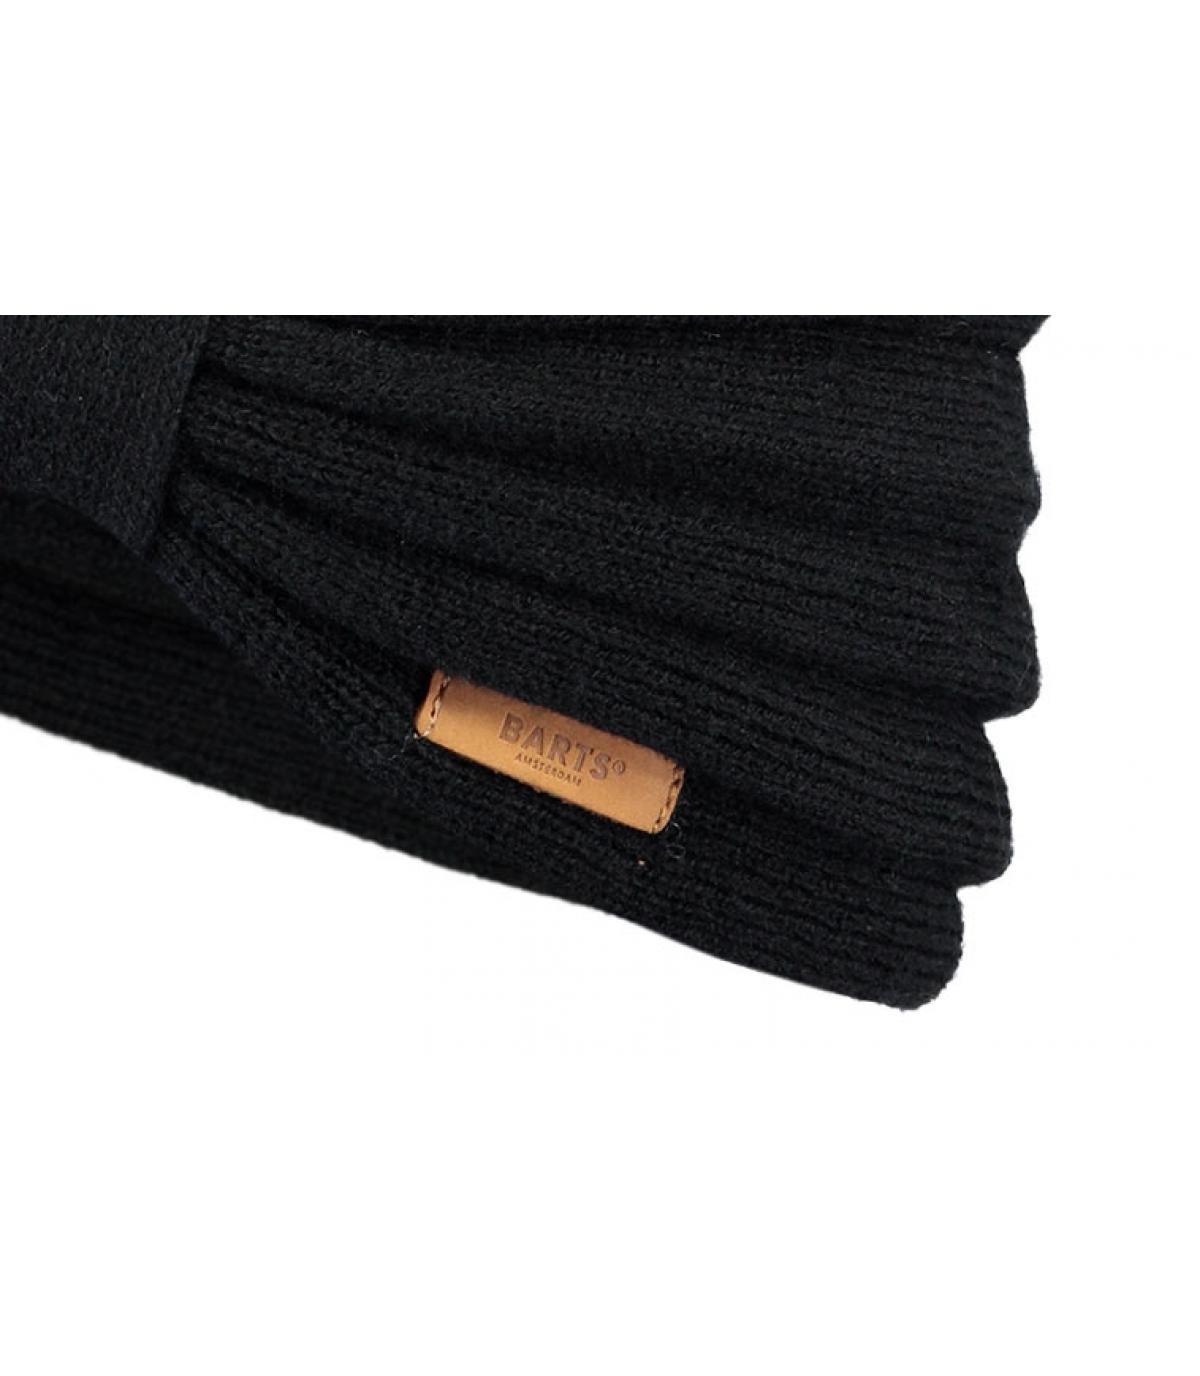 Details Zitoun Headband black - afbeeling 3